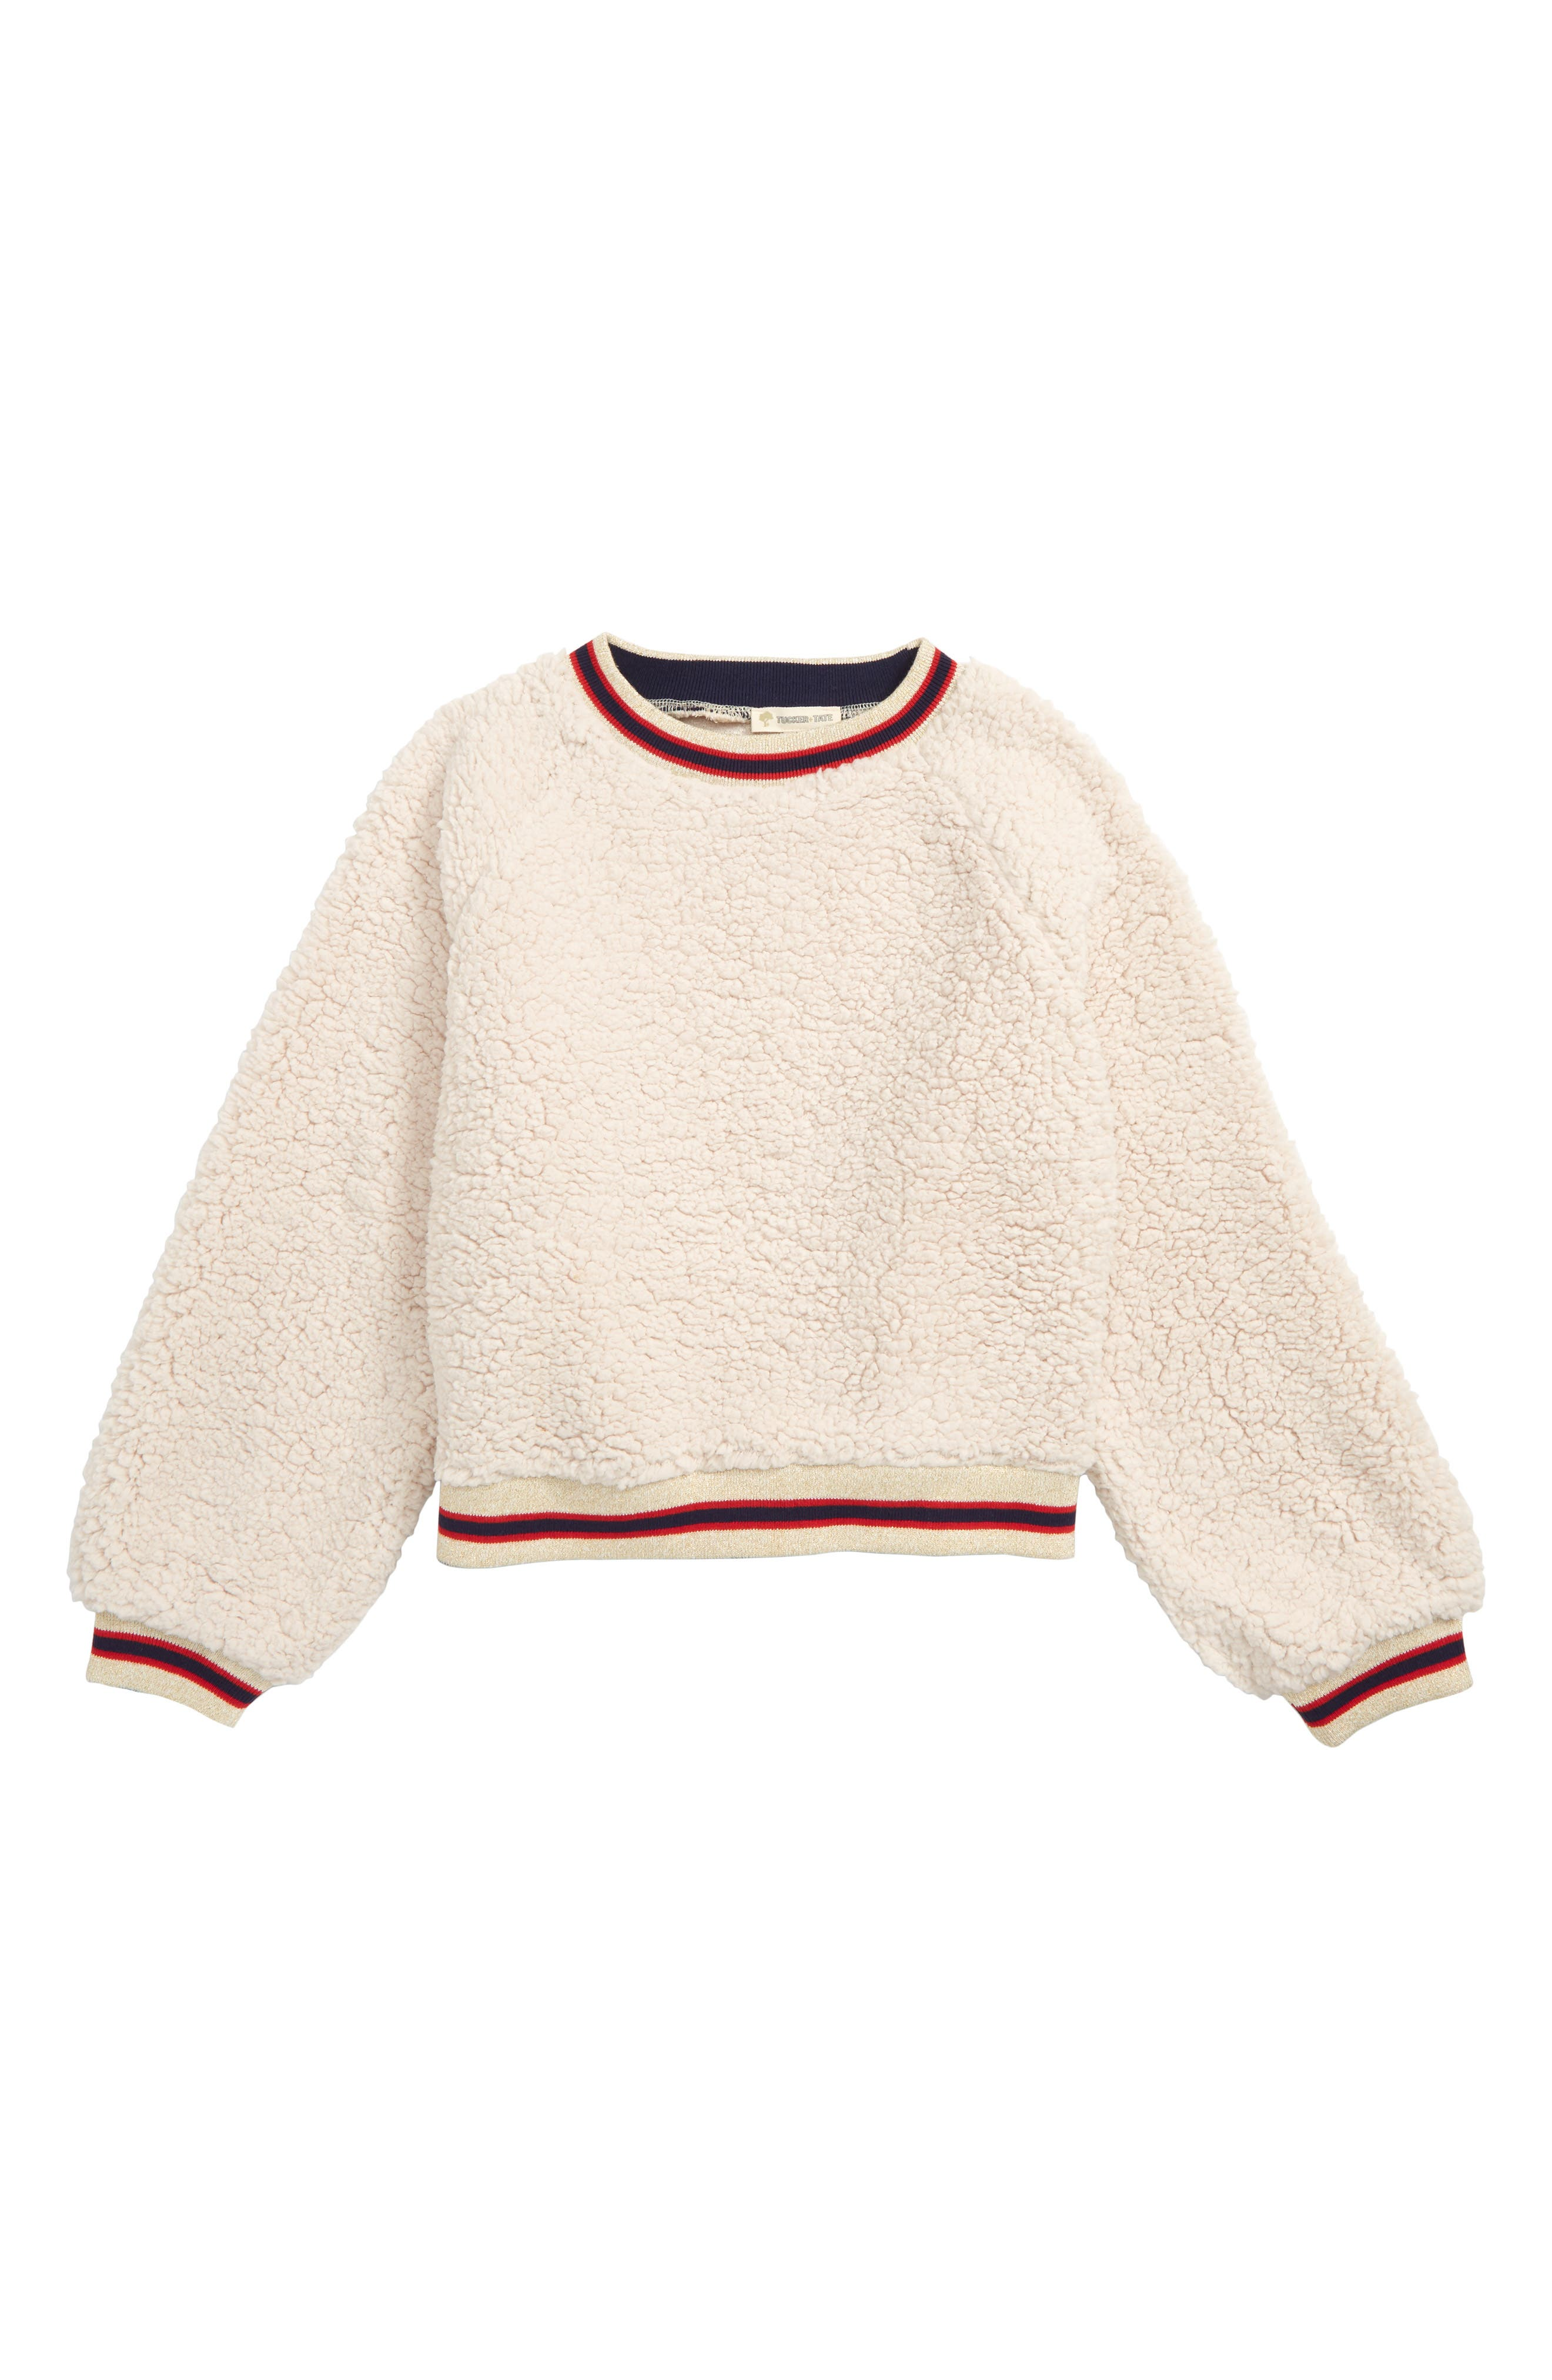 Varsity Faux Fur Sweatshirt,                             Main thumbnail 1, color,                             IVORY EGRET